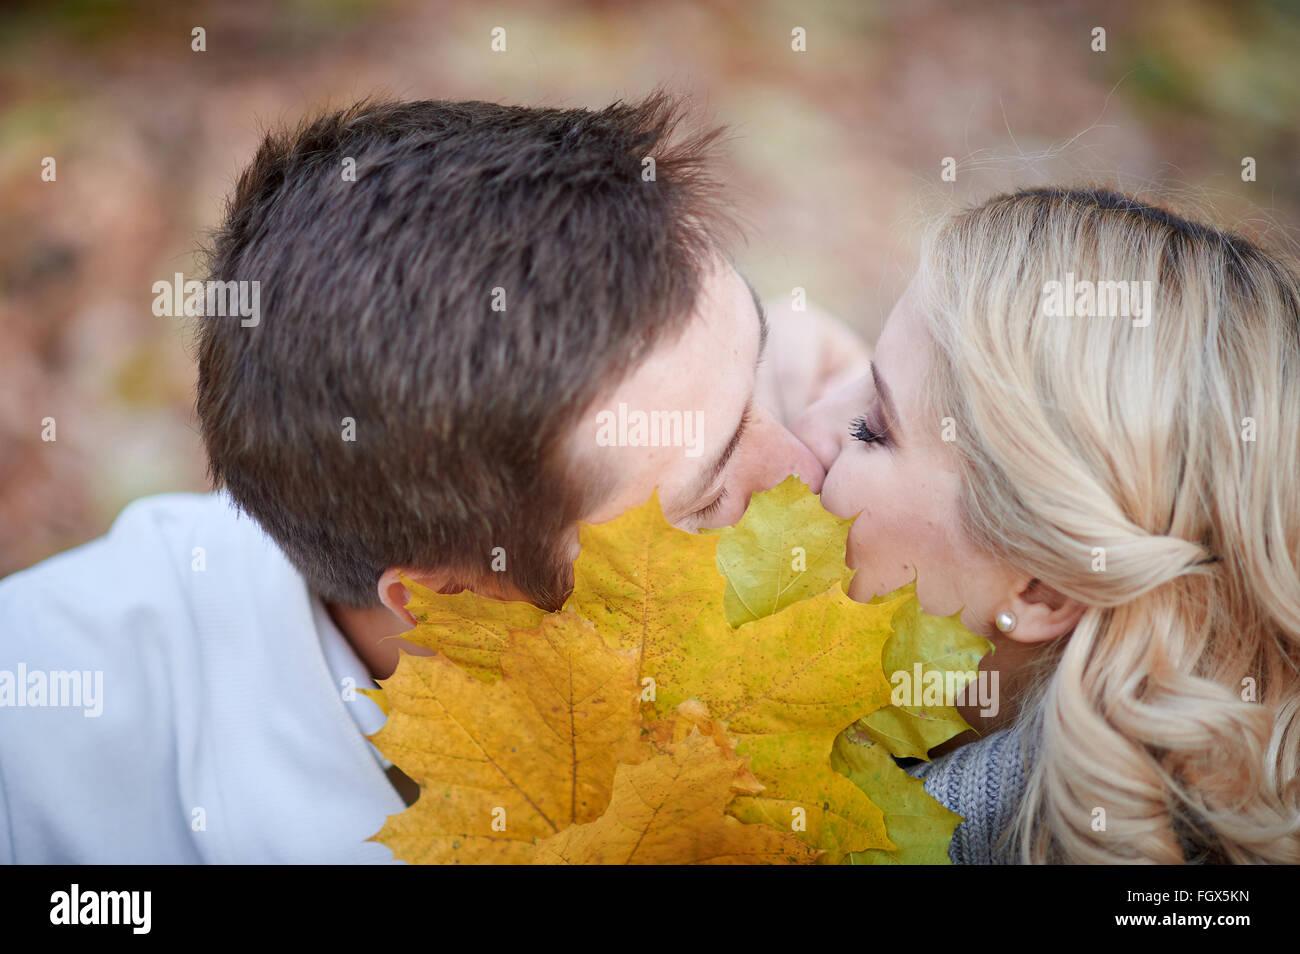 Liebespaar im Herbst Park küssen Stockbild